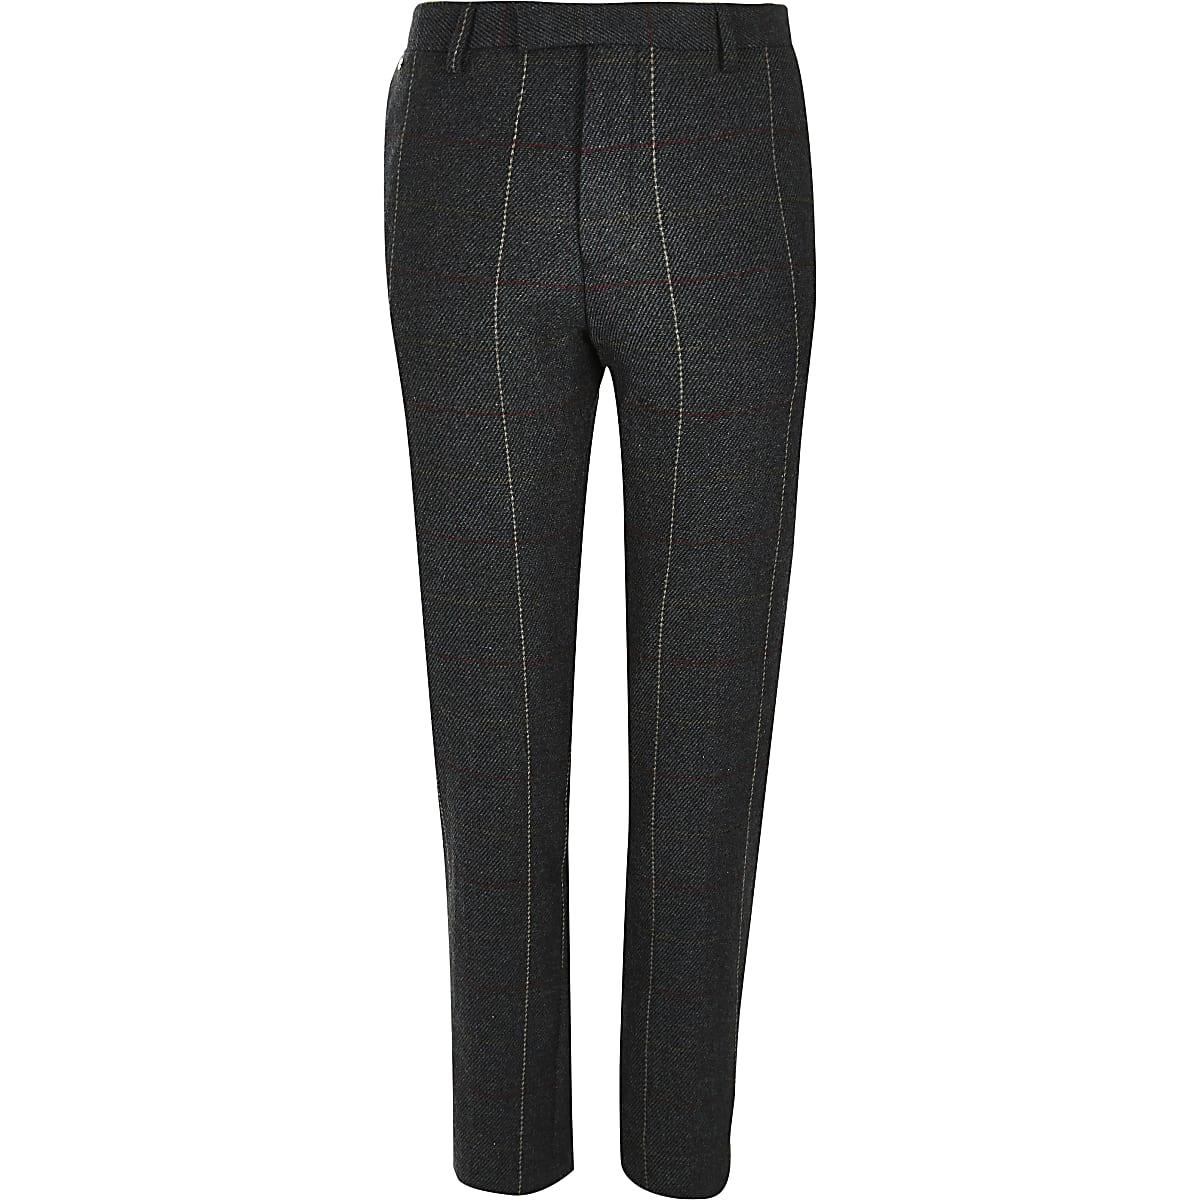 Dark green check skinny suit trousers